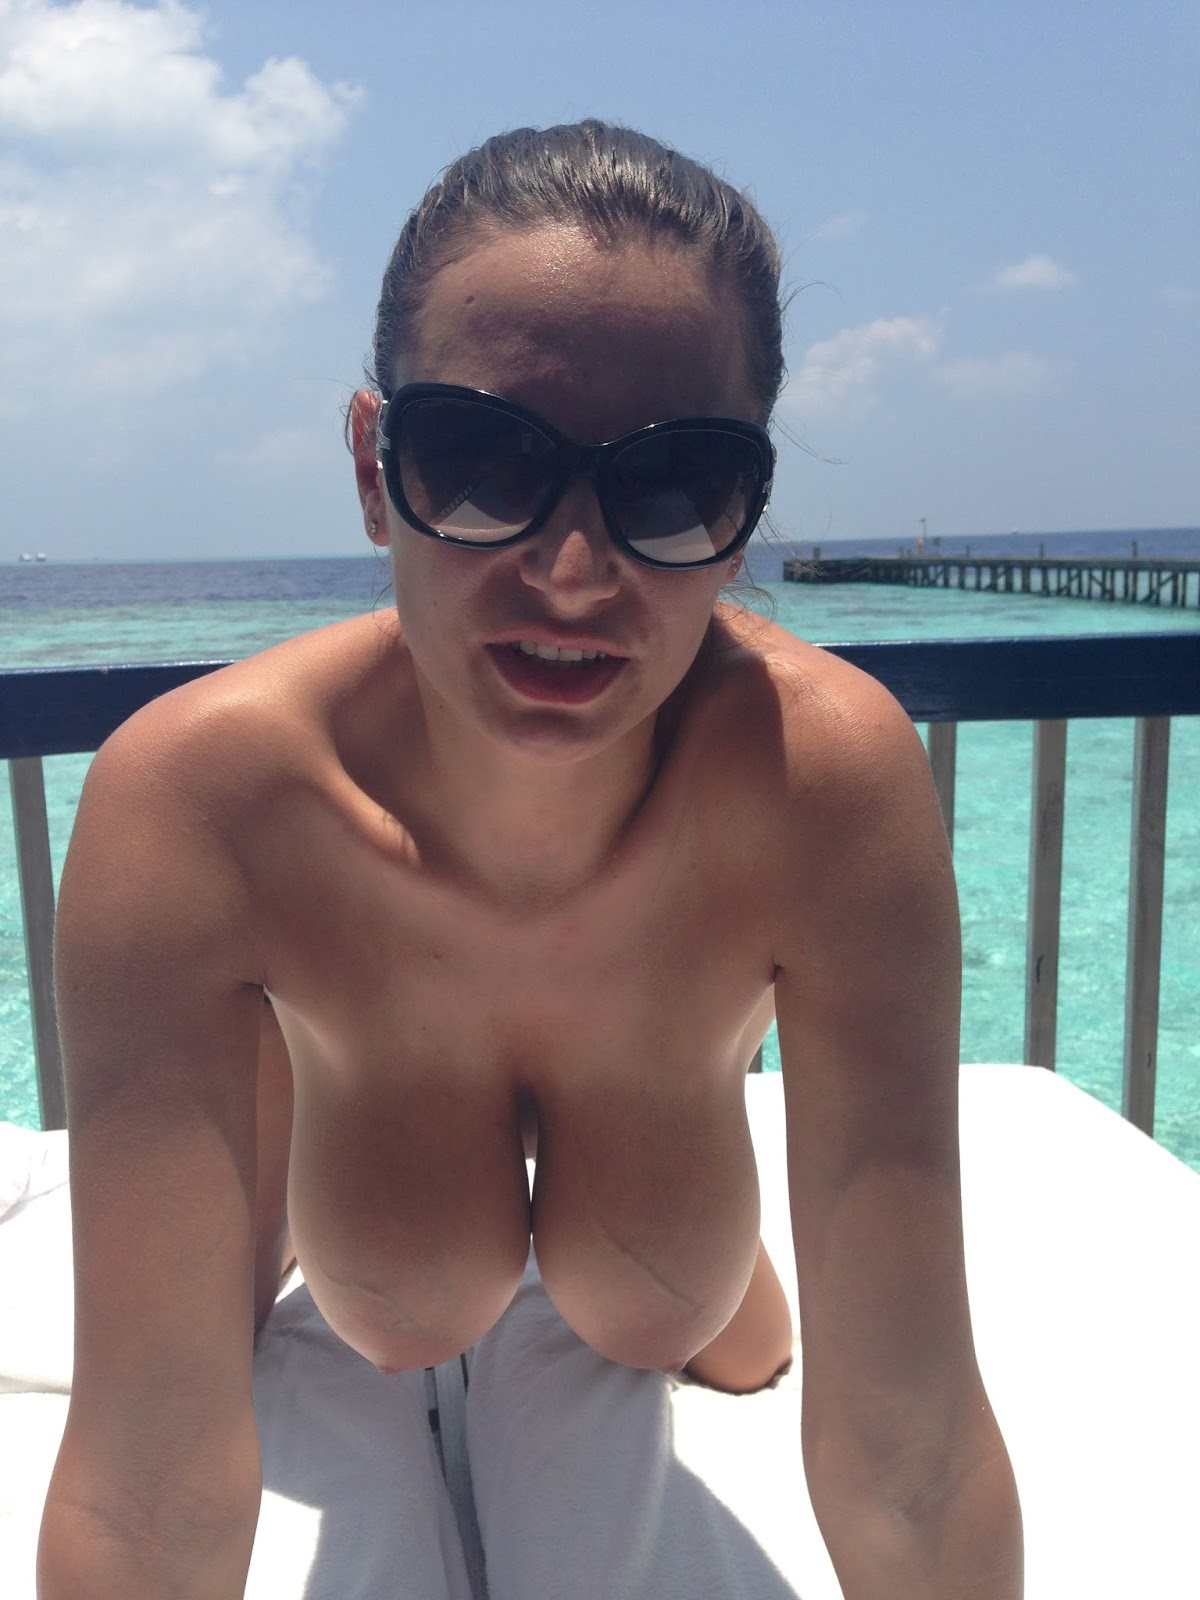 Hot ebony female adult film star